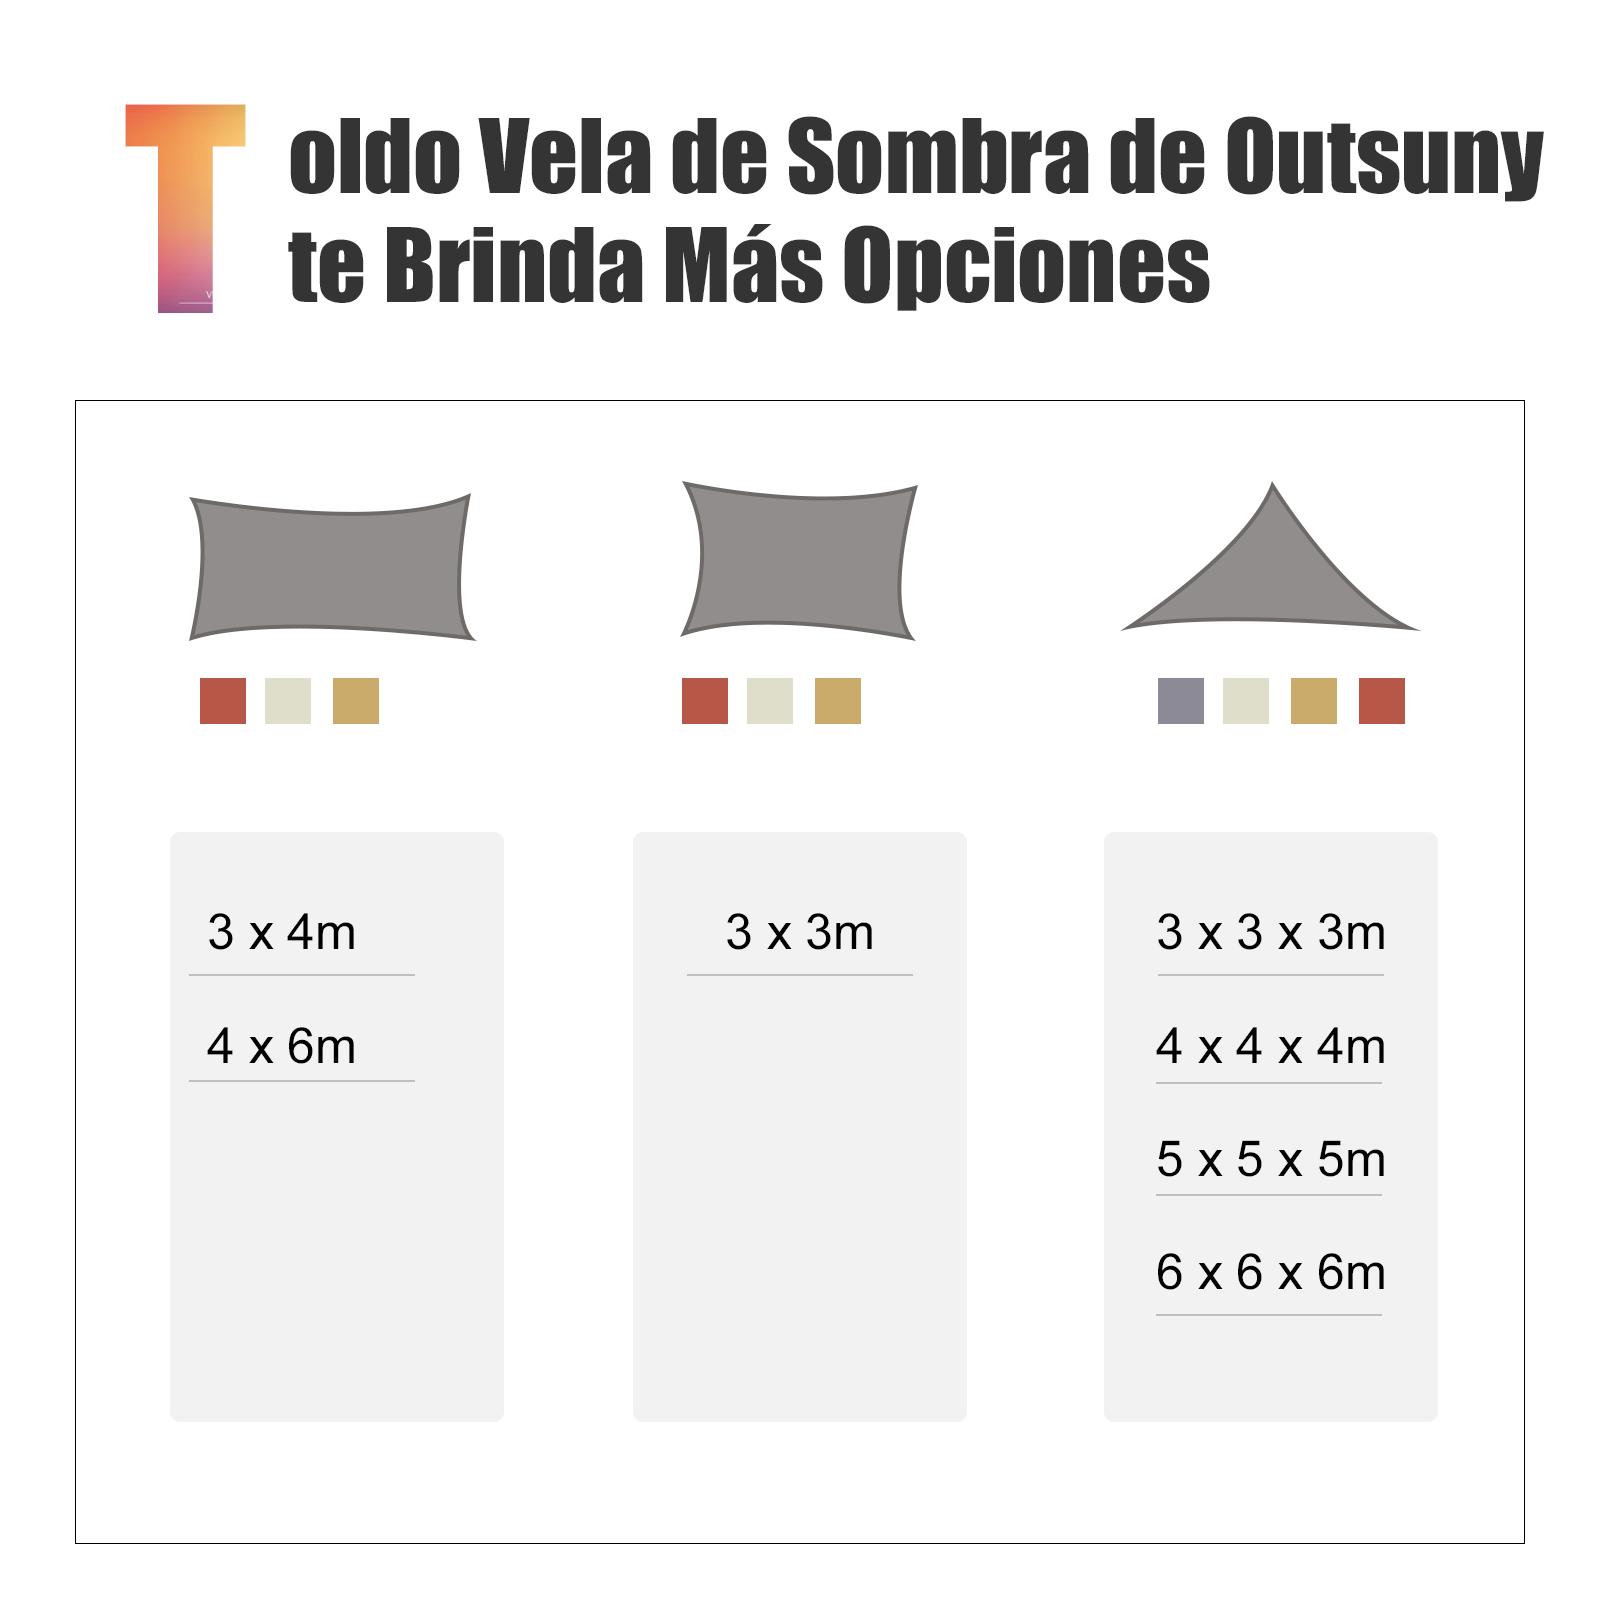 Toldo-Vela-Sombrilla-Parasol-Triangulo-Tejido-de-Poliester-185-g-m-Jardin-Playa miniatura 15